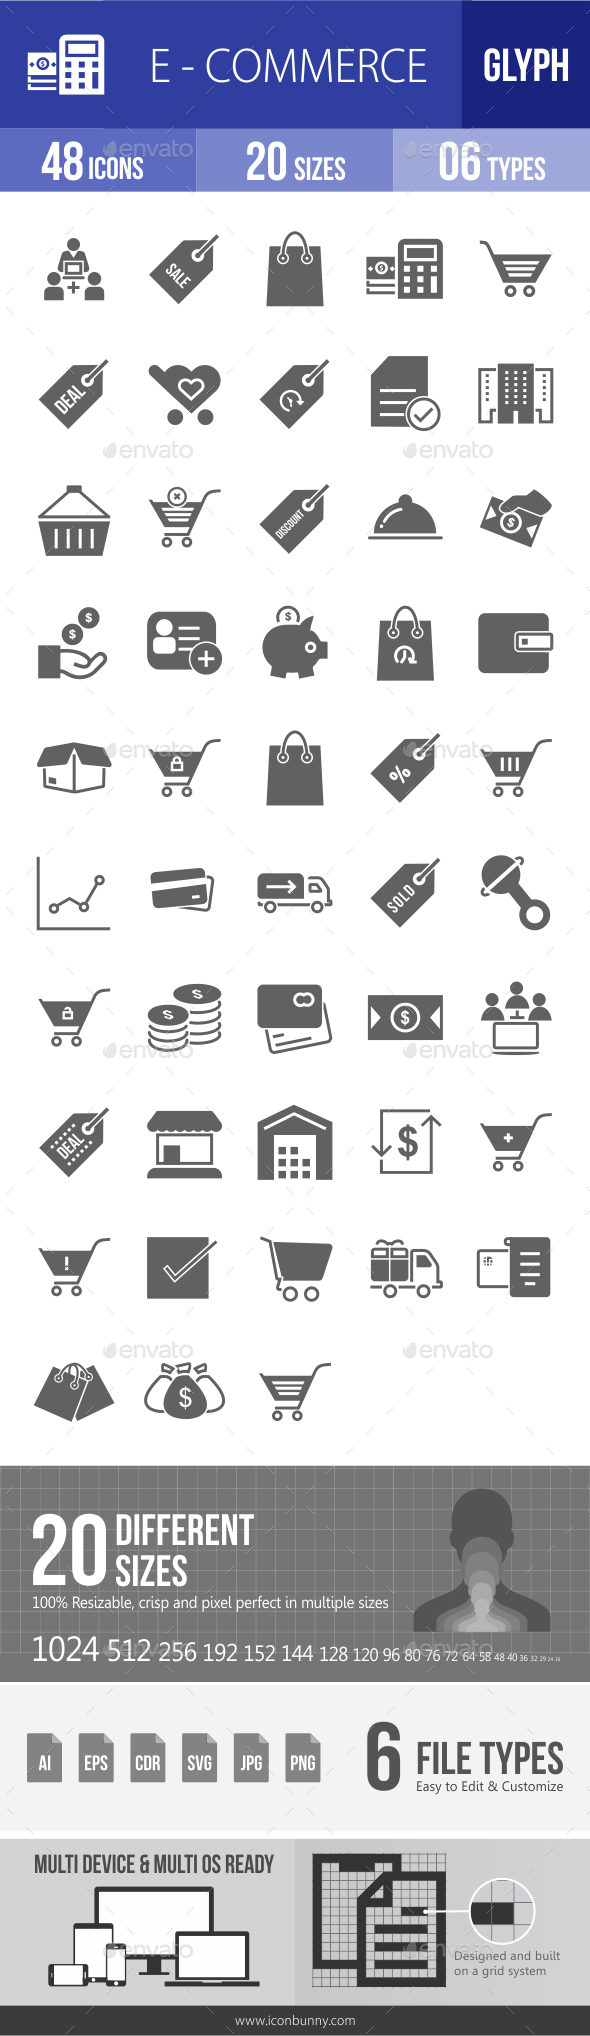 Ecommerce Glyph Icons - Icons